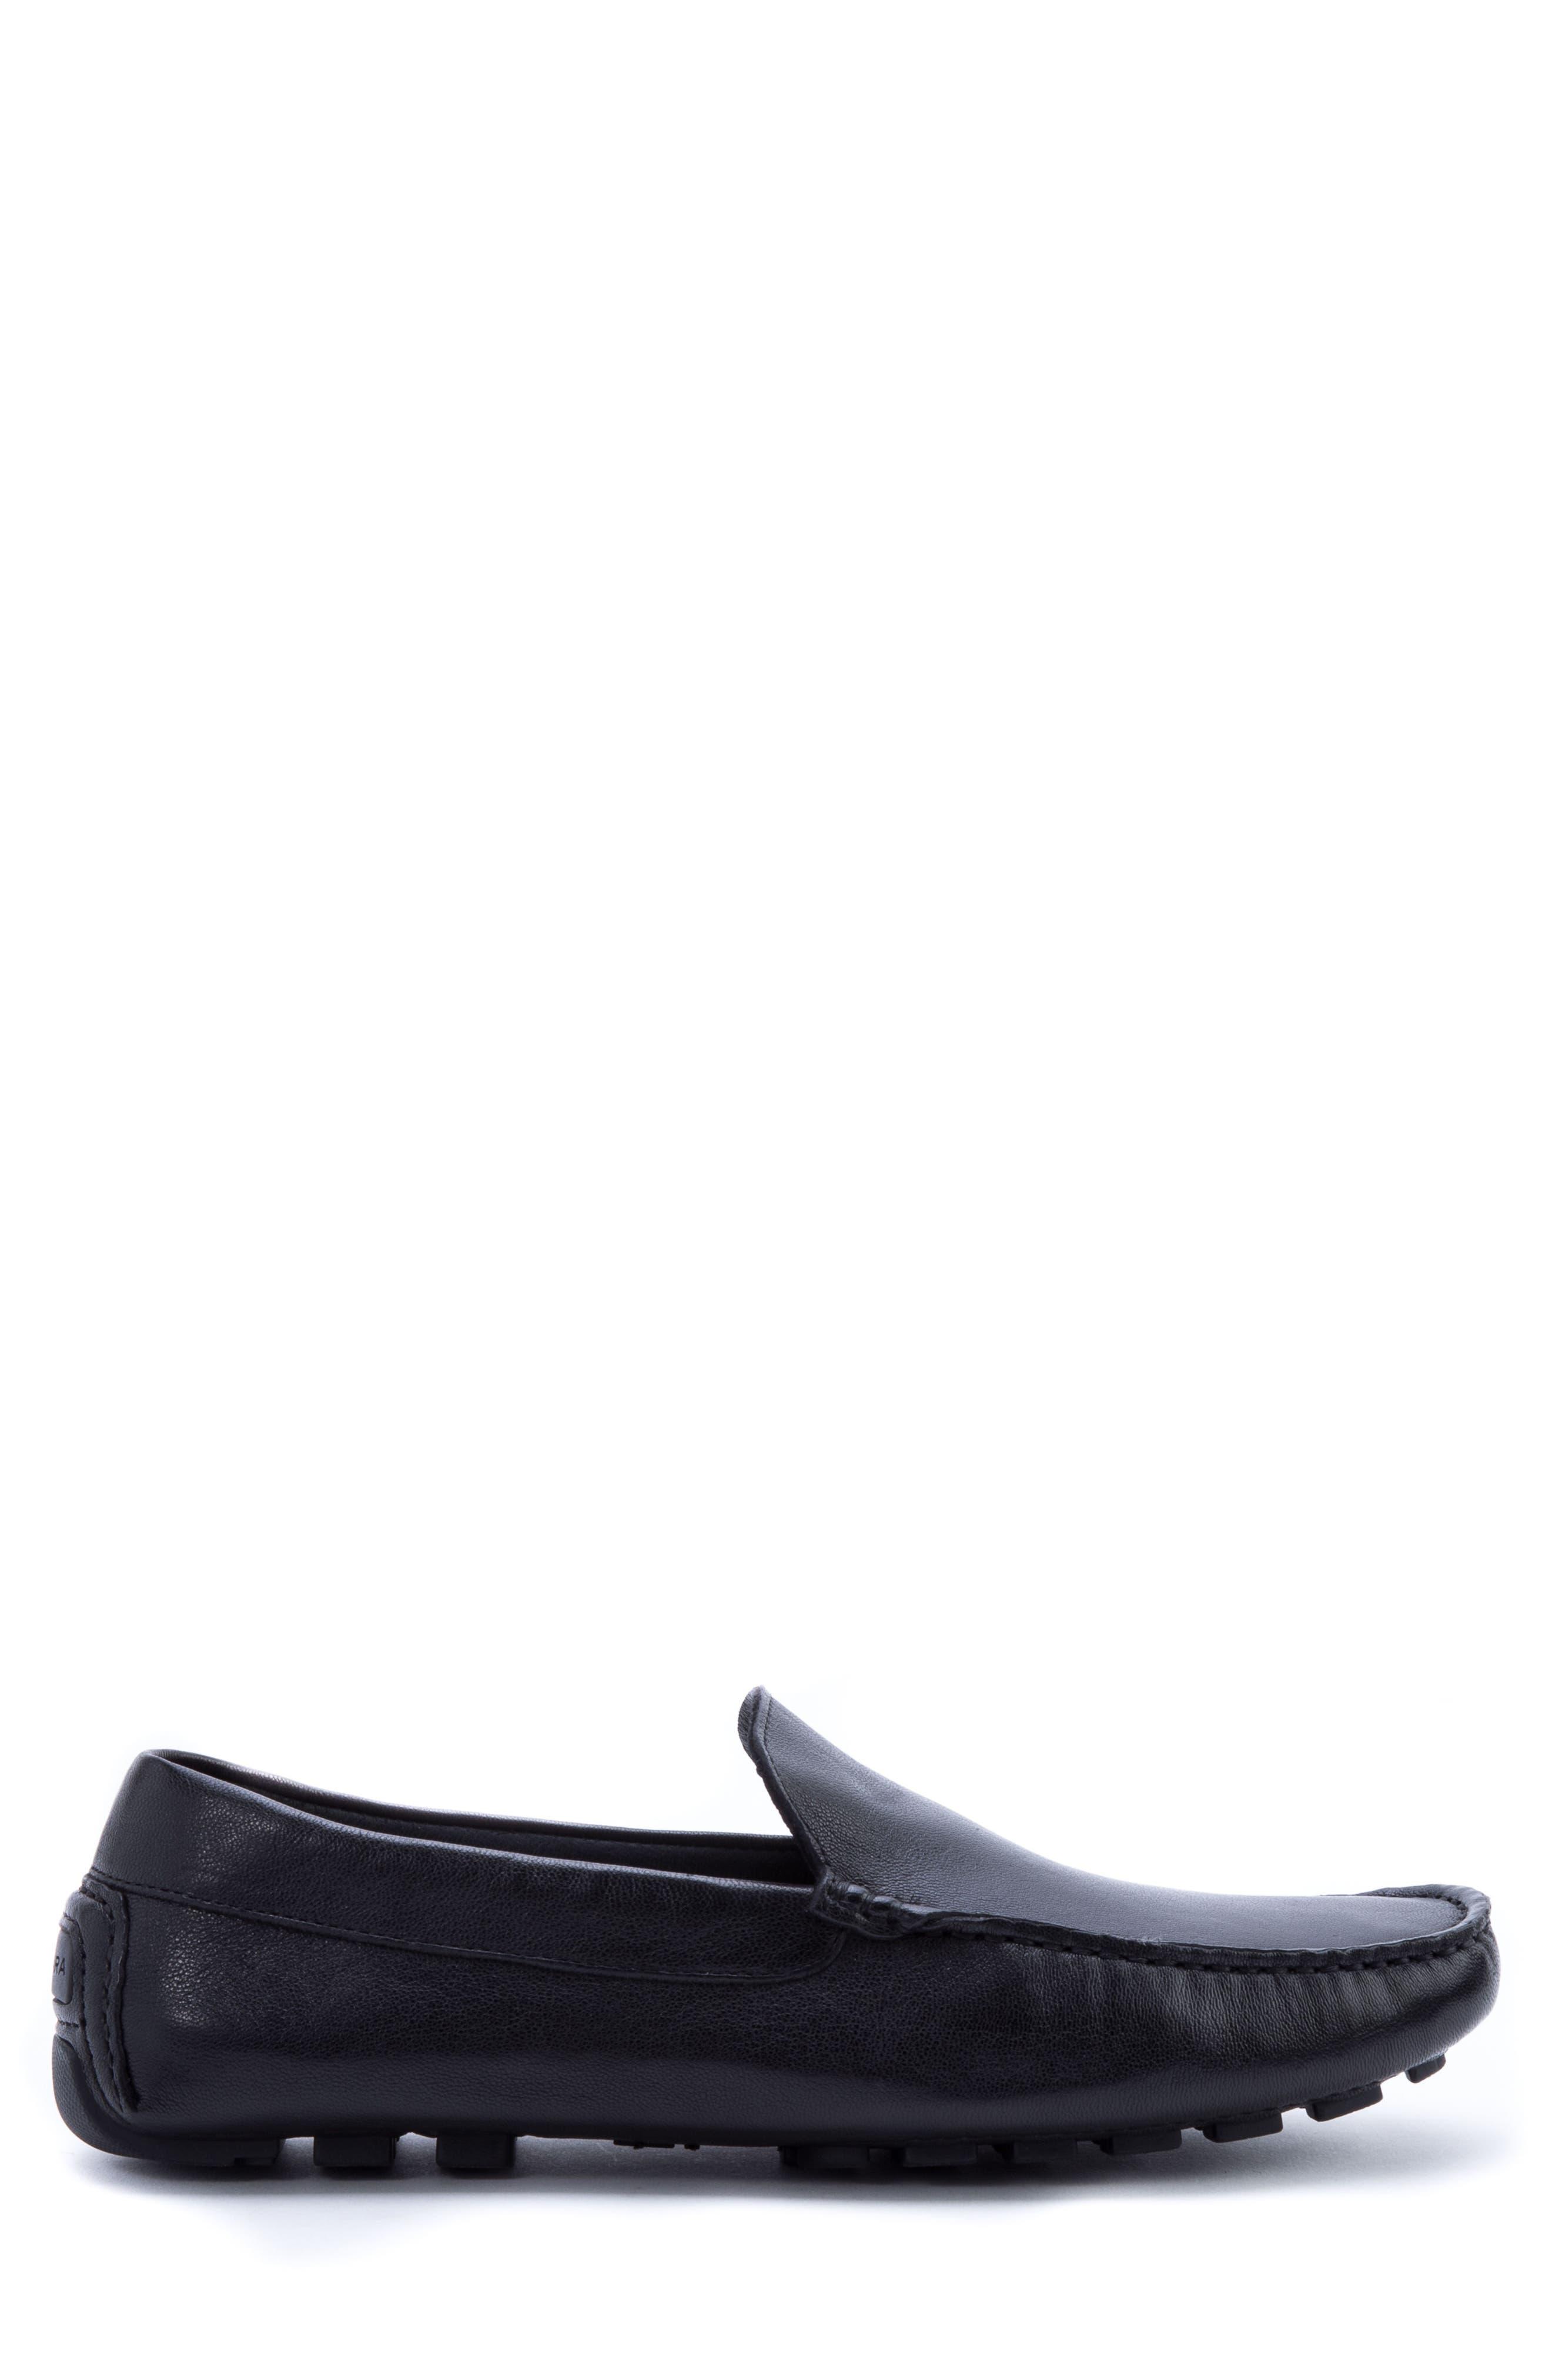 ZANZARA,                             Picasso 3 Moc Toe Driving Loafer,                             Alternate thumbnail 3, color,                             BLACK LEATHER